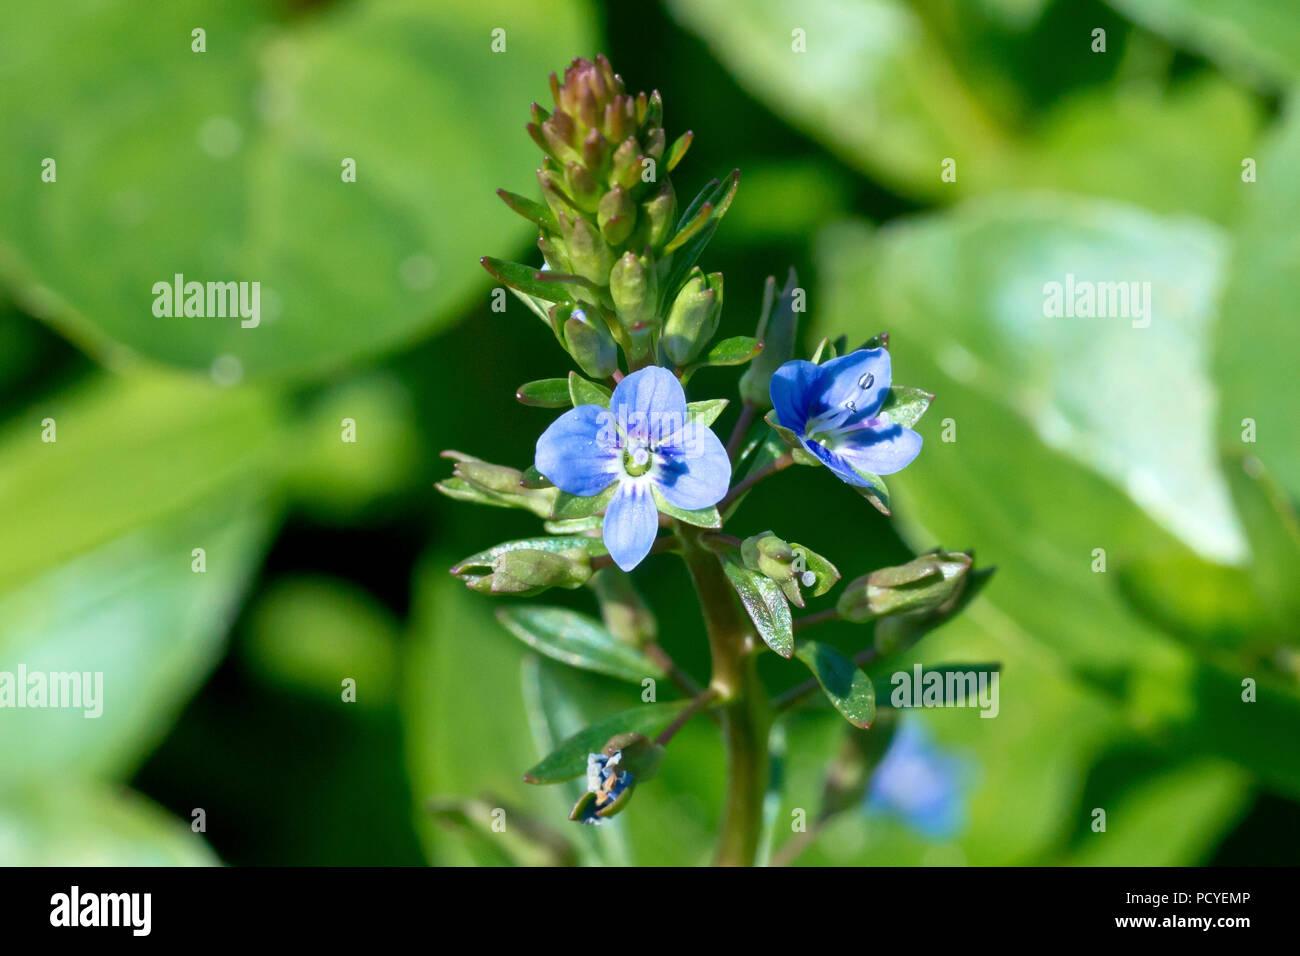 Brooklime (veronica beccabunga), close up of a single flowering spike. Stock Photo